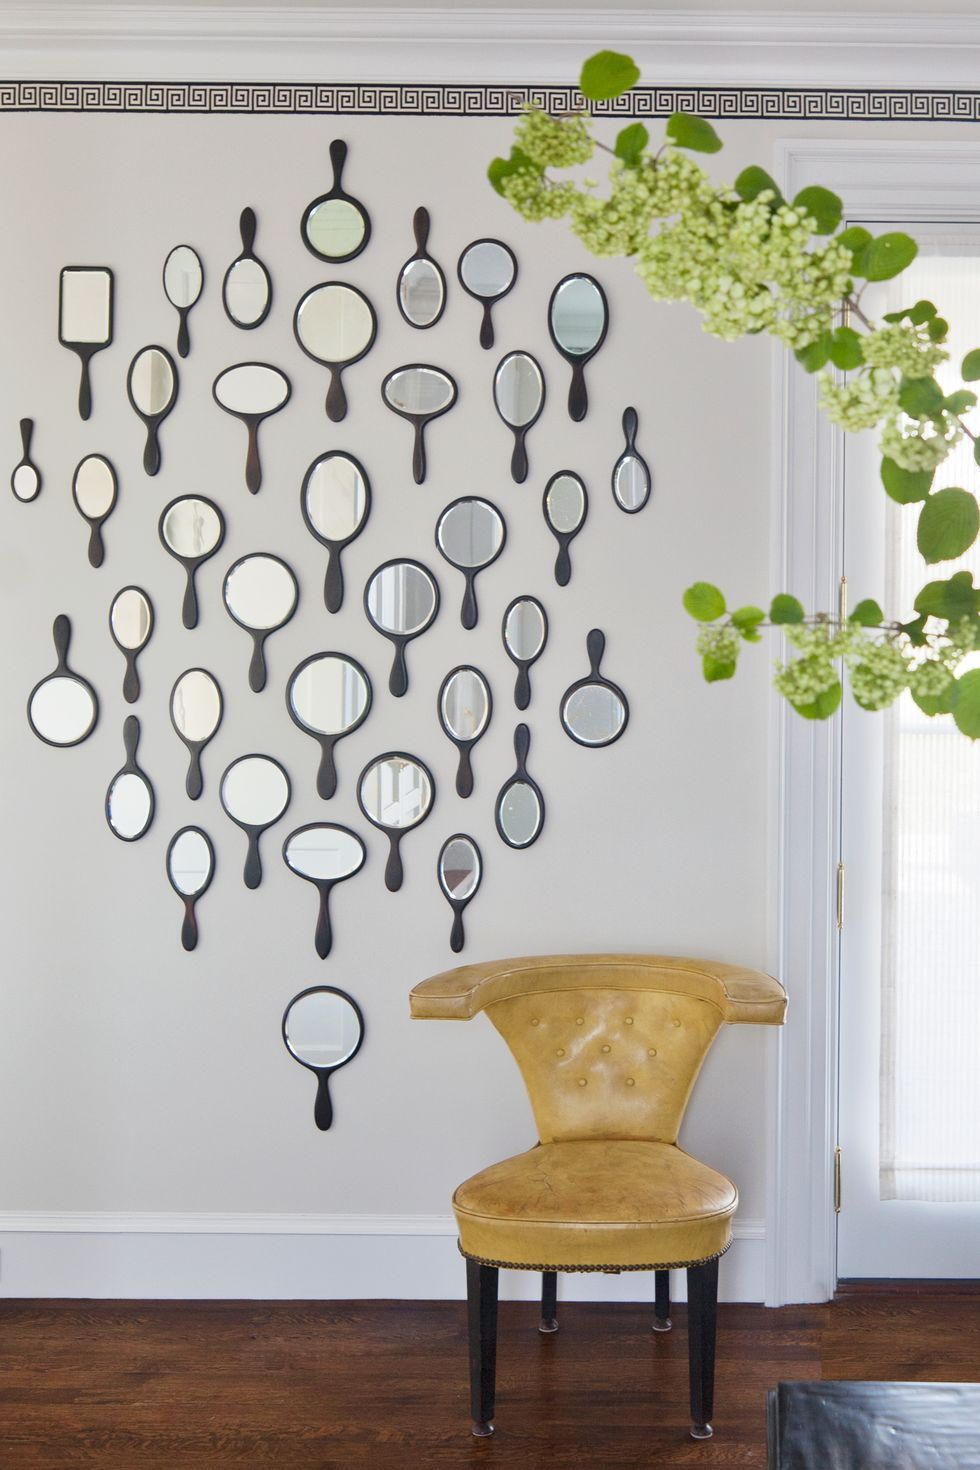 17 Easy Diy Wall Decor Ideas Inspired By Interiors Designers In 2020 Diy Wall Decor Diy Wall Art Decor Simple Wall Decor